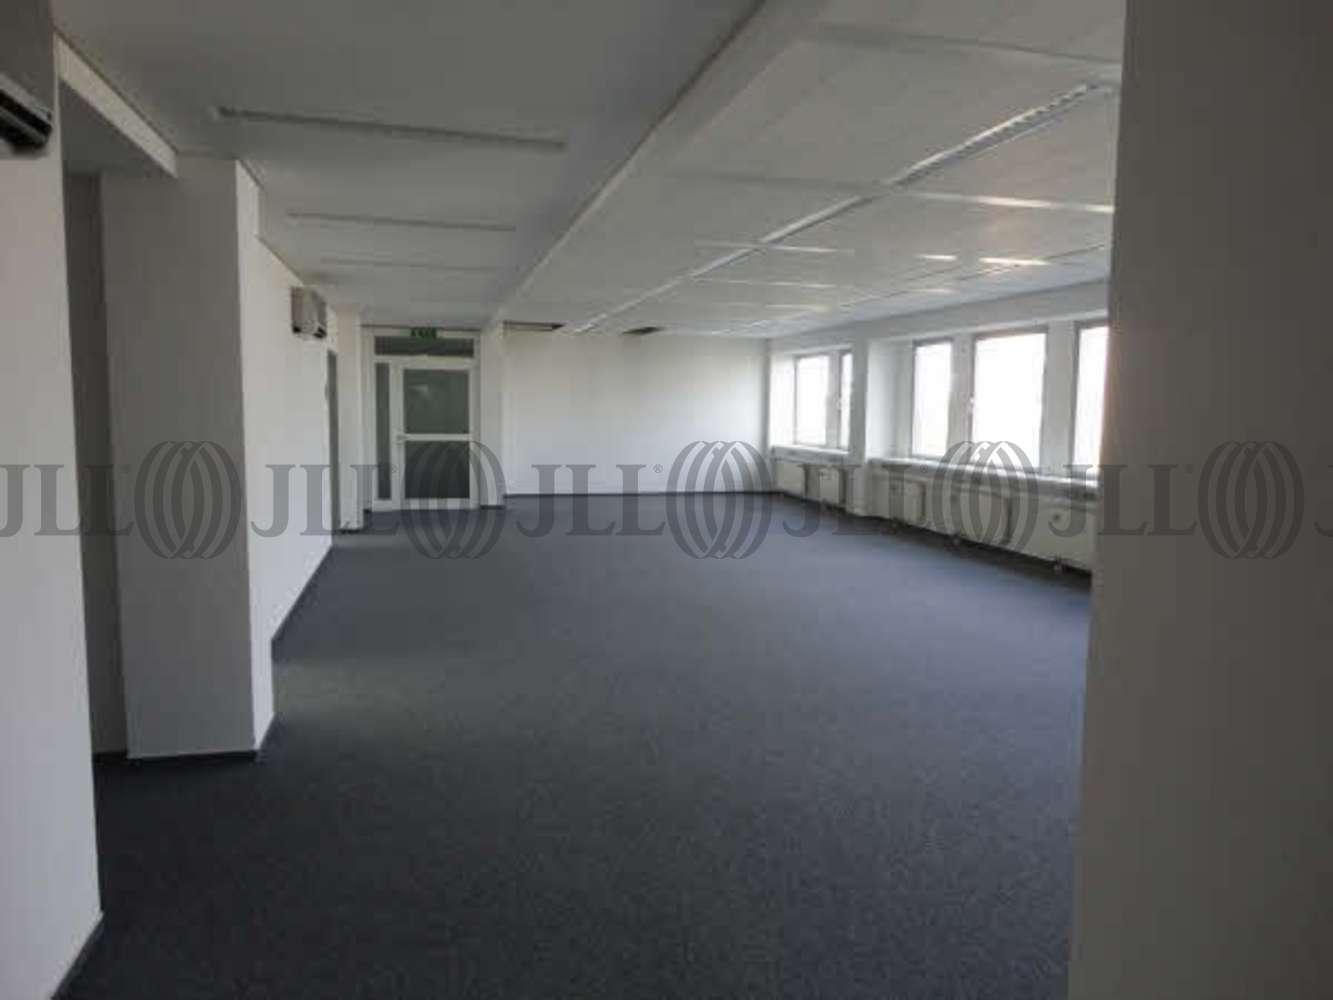 Büros Frankfurt am main, 60439 - Büro - Frankfurt am Main, Niederursel - F1062 - 10605561